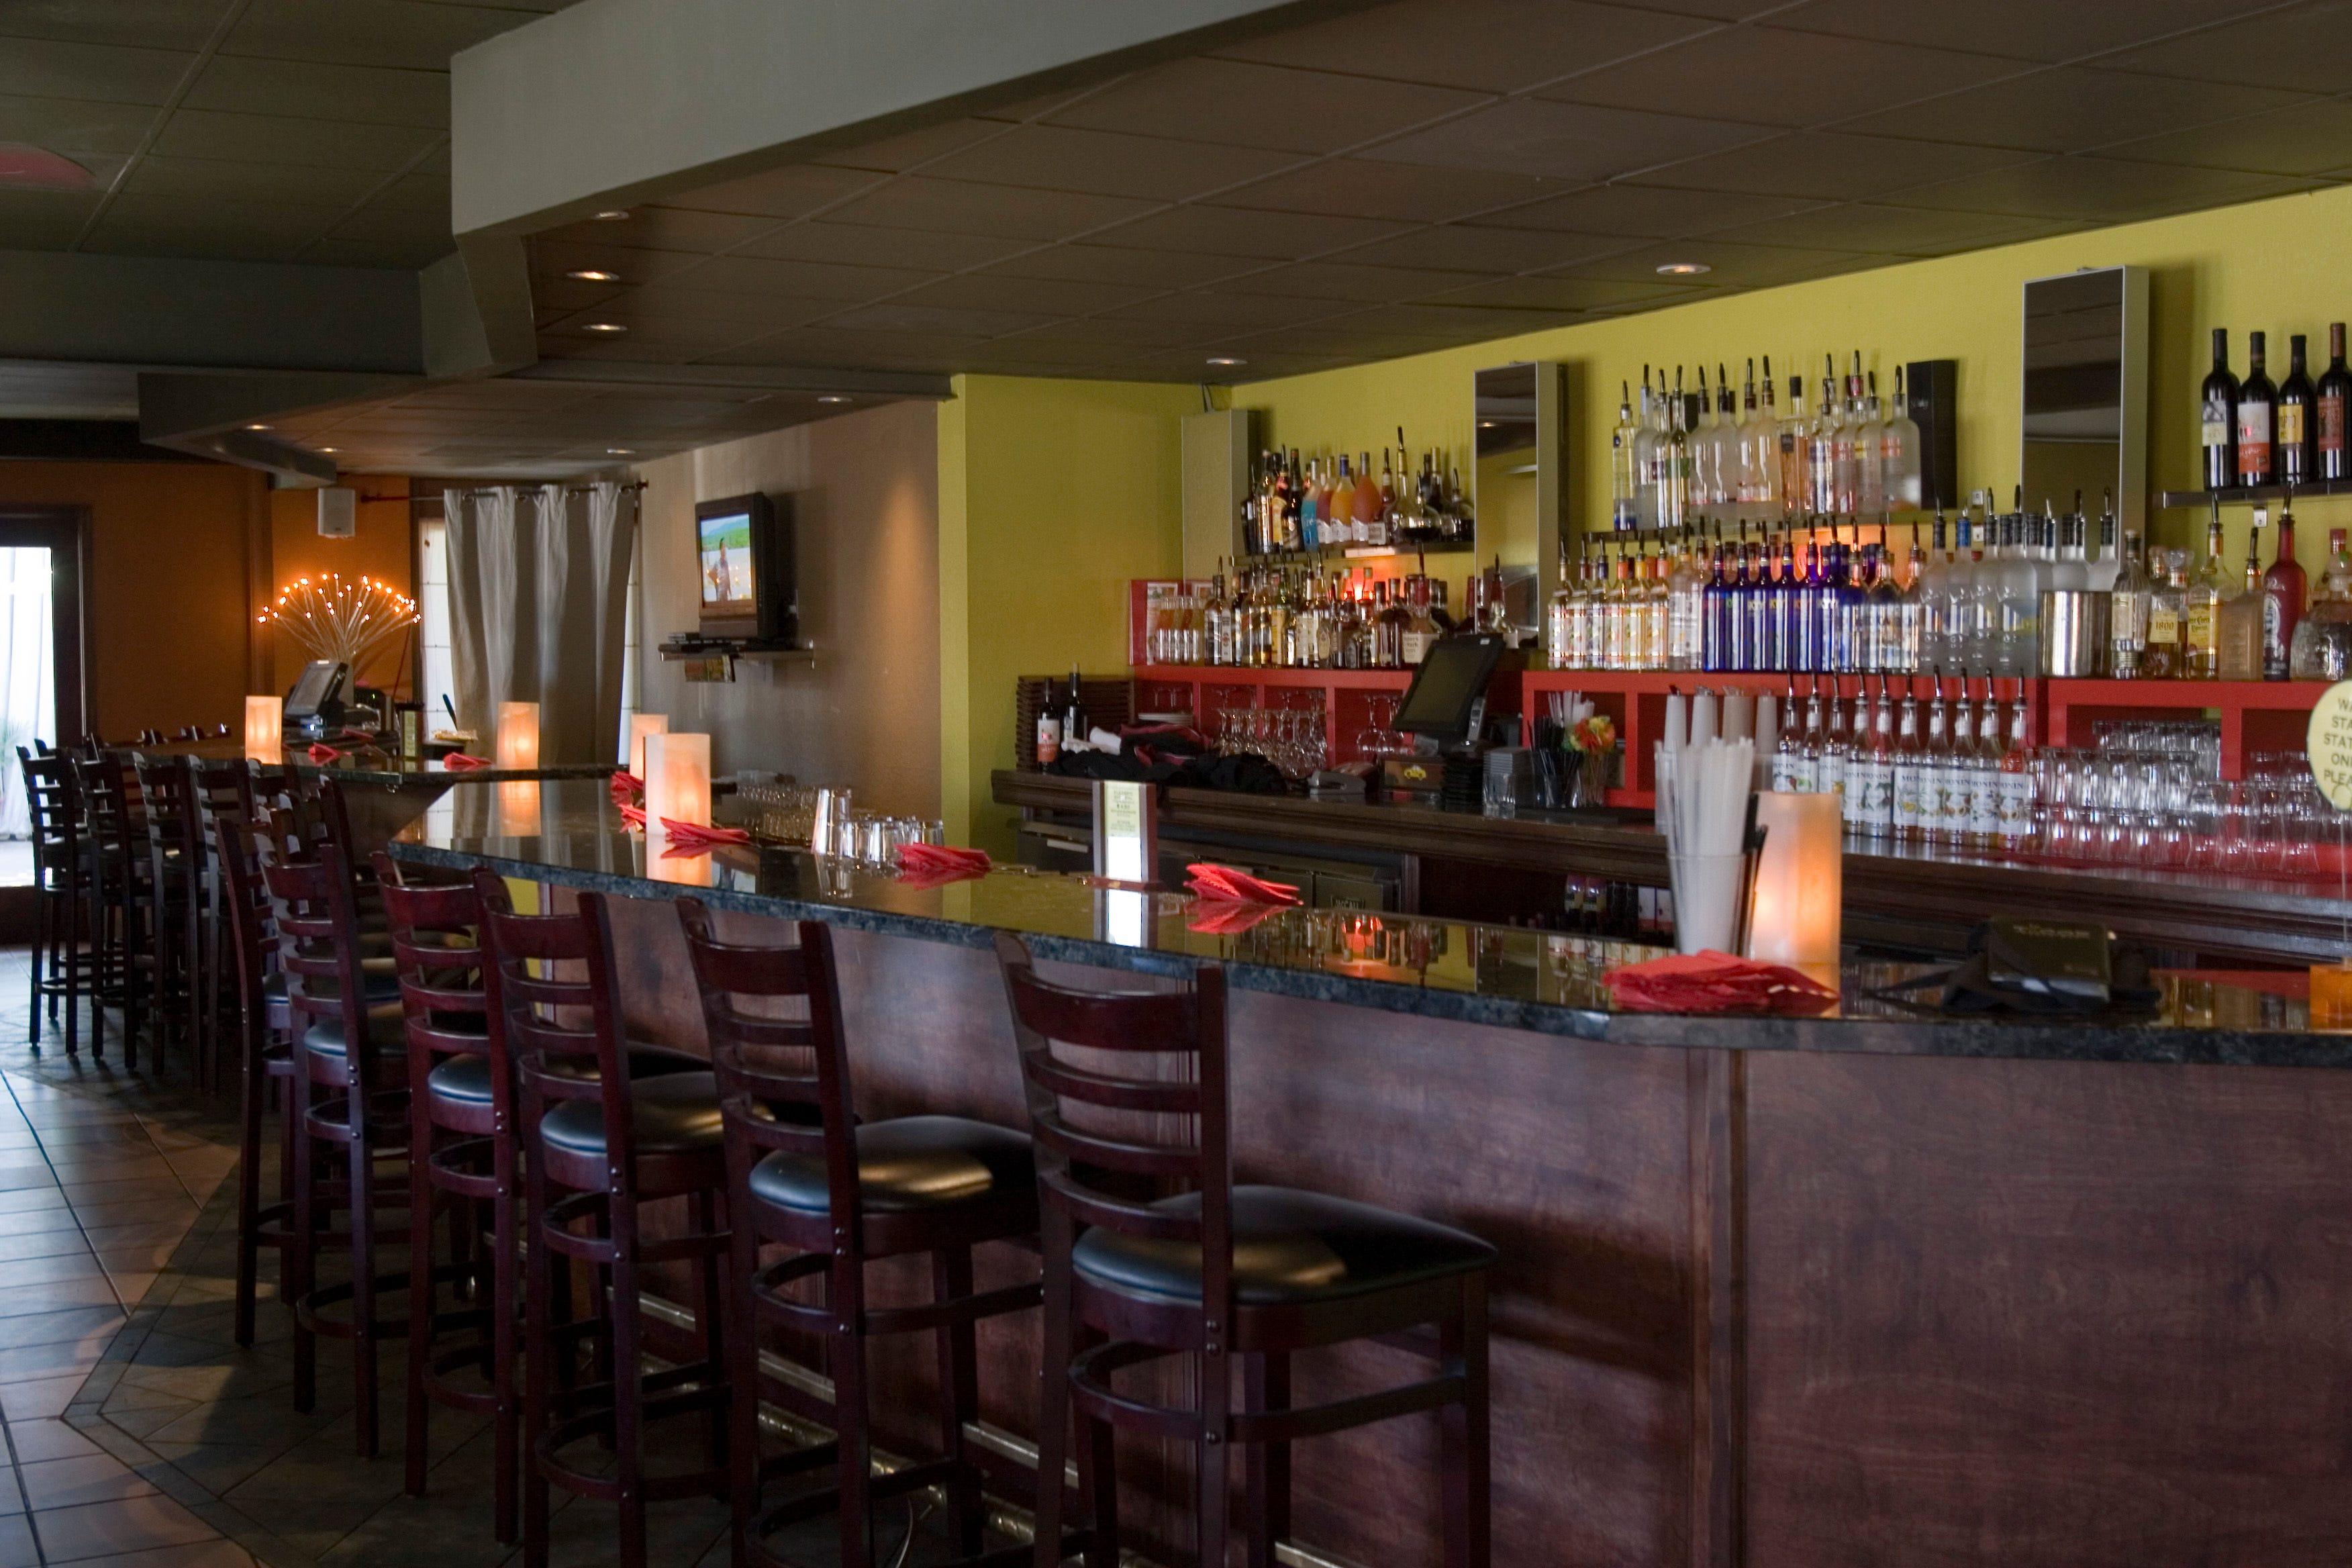 Ticoz Latin Kitchen to close in Phoenix on July 30 ending 10year run